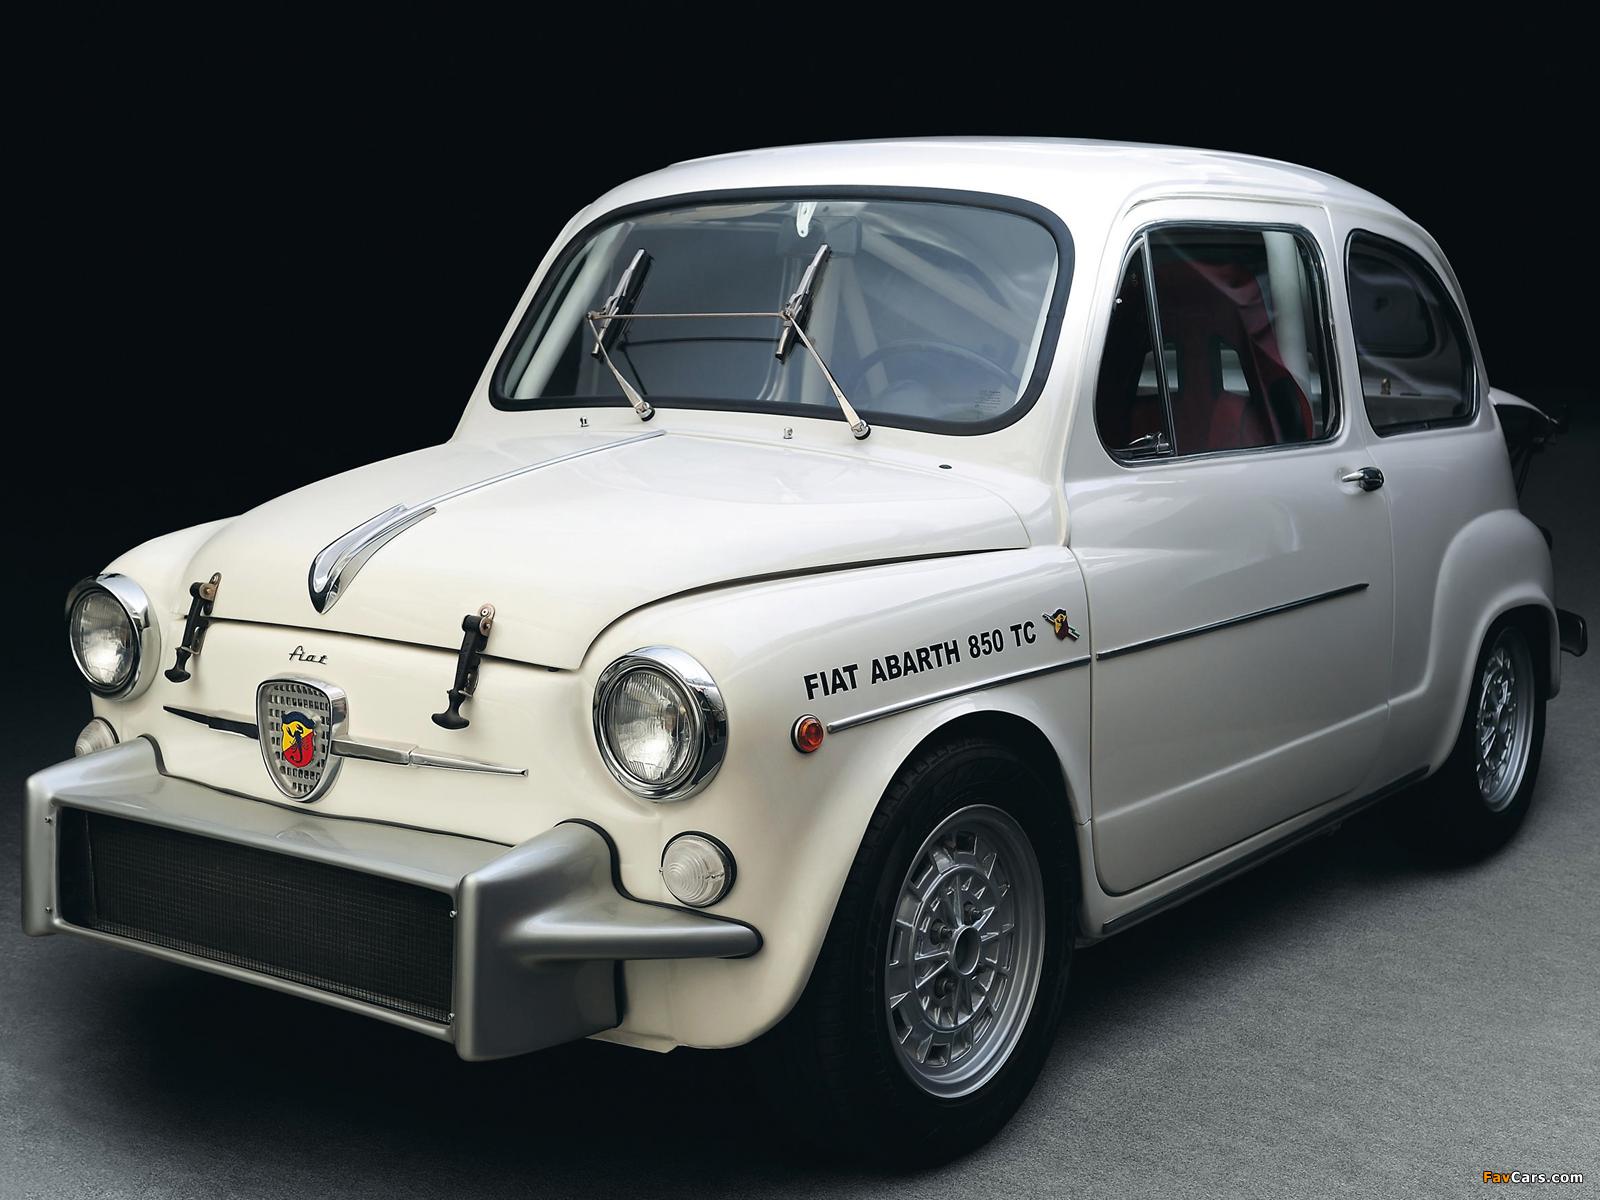 Fiat Abarth 850 Tc Corsa 1965 1966 Photos 1600x1200